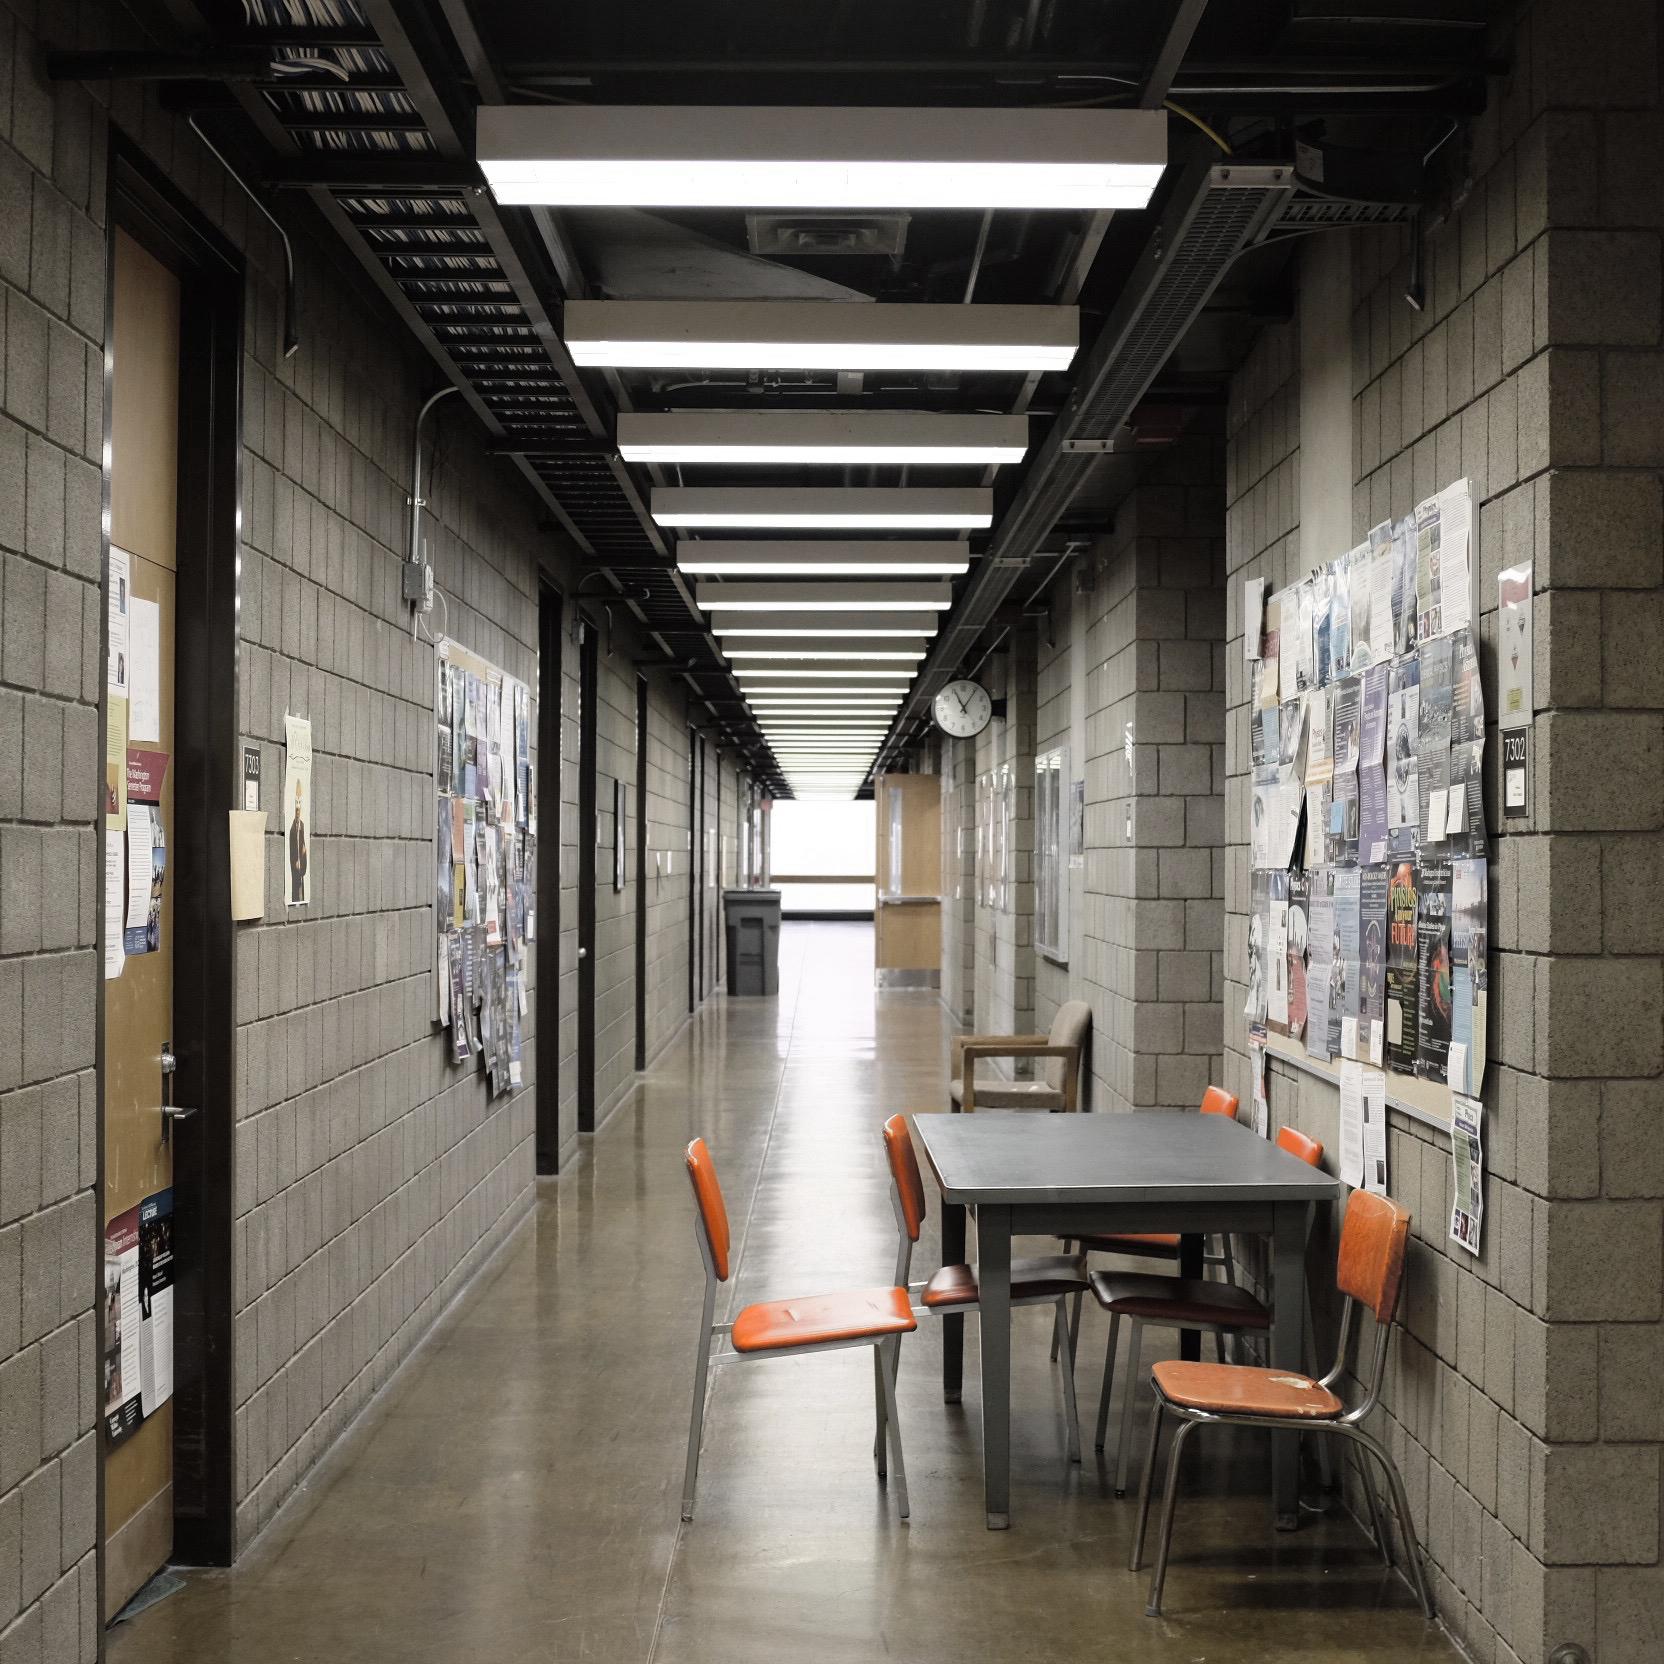 """Concrete torture chamber"" - Wean Hall (Seventh floor)"